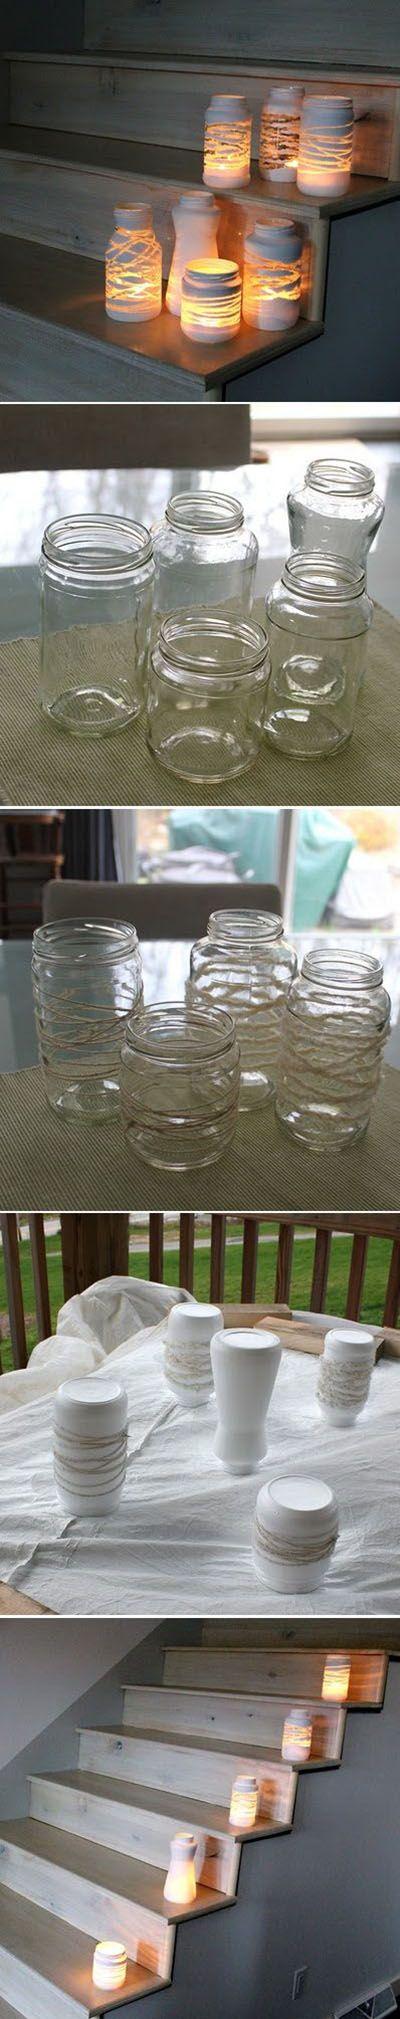 DIY Yarn Wrapped Jam Jars   DIY & Crafts Tutorials